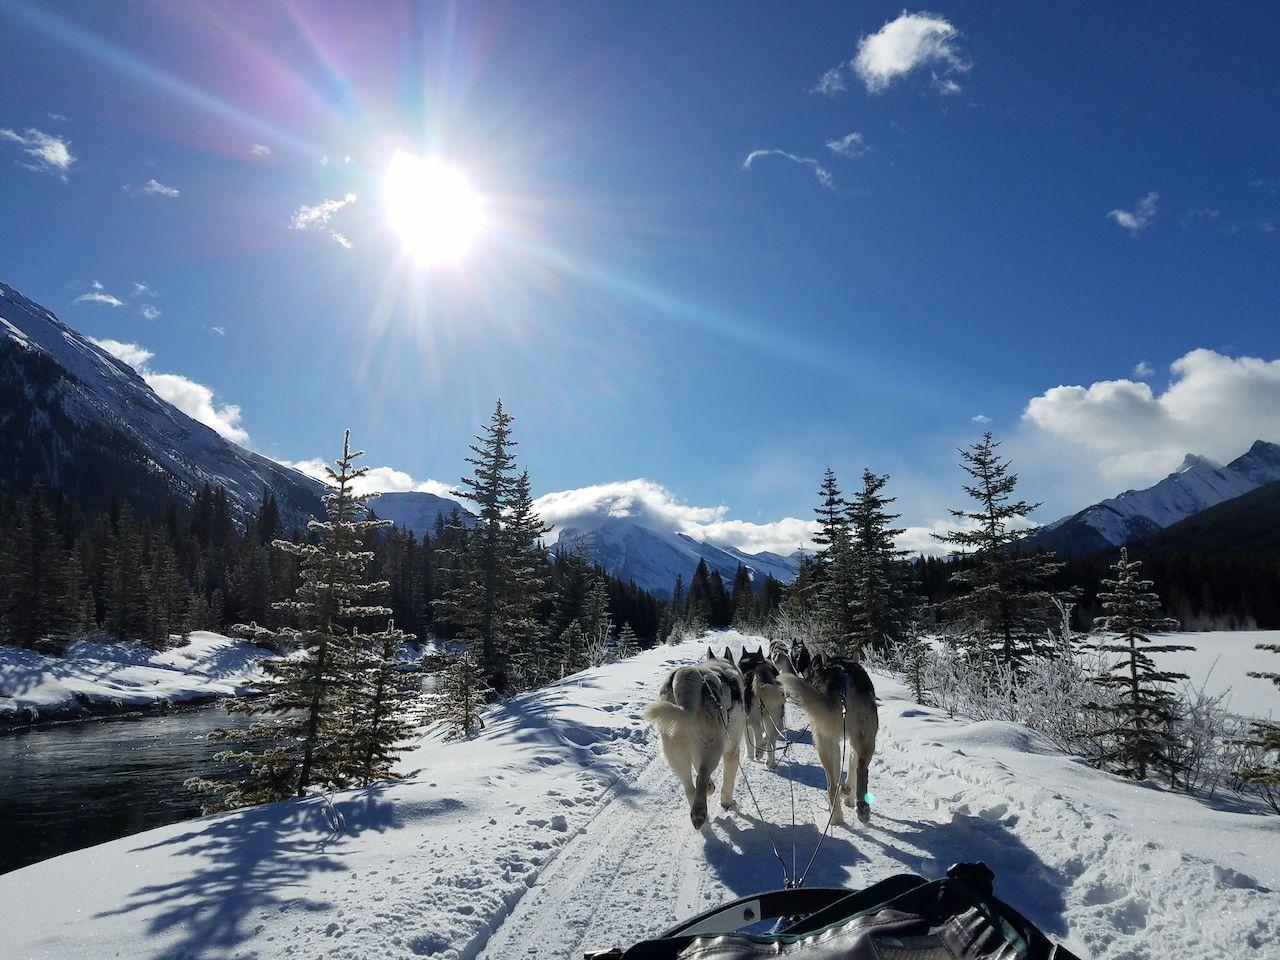 Dog sledding through the mountains in Canada